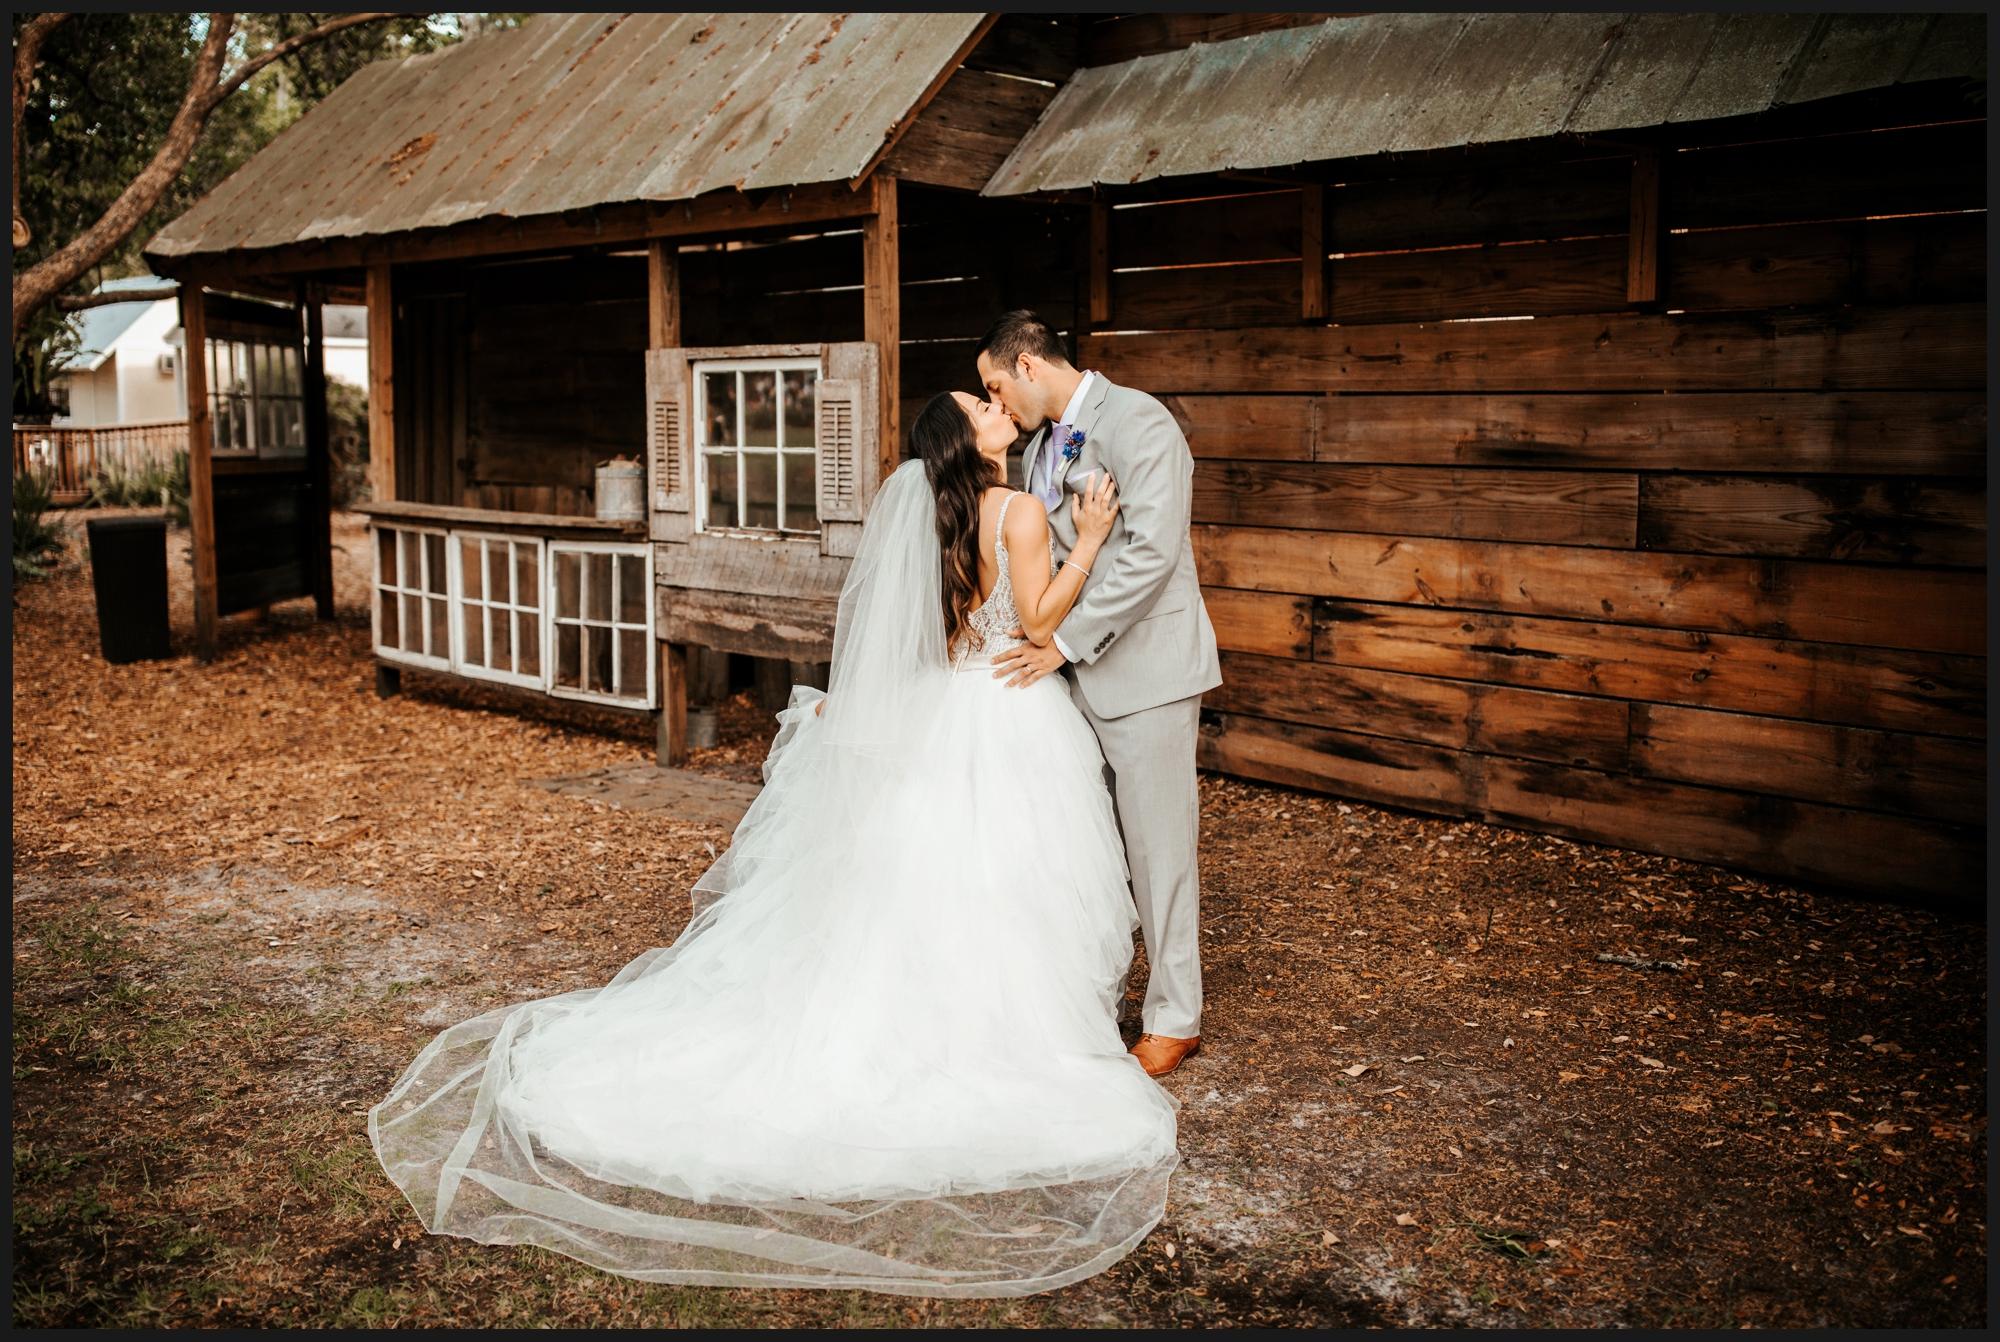 Orlando-Wedding-Photographer-destination-wedding-photographer-florida-wedding-photographer-bohemian-wedding-photographer_1627.jpg